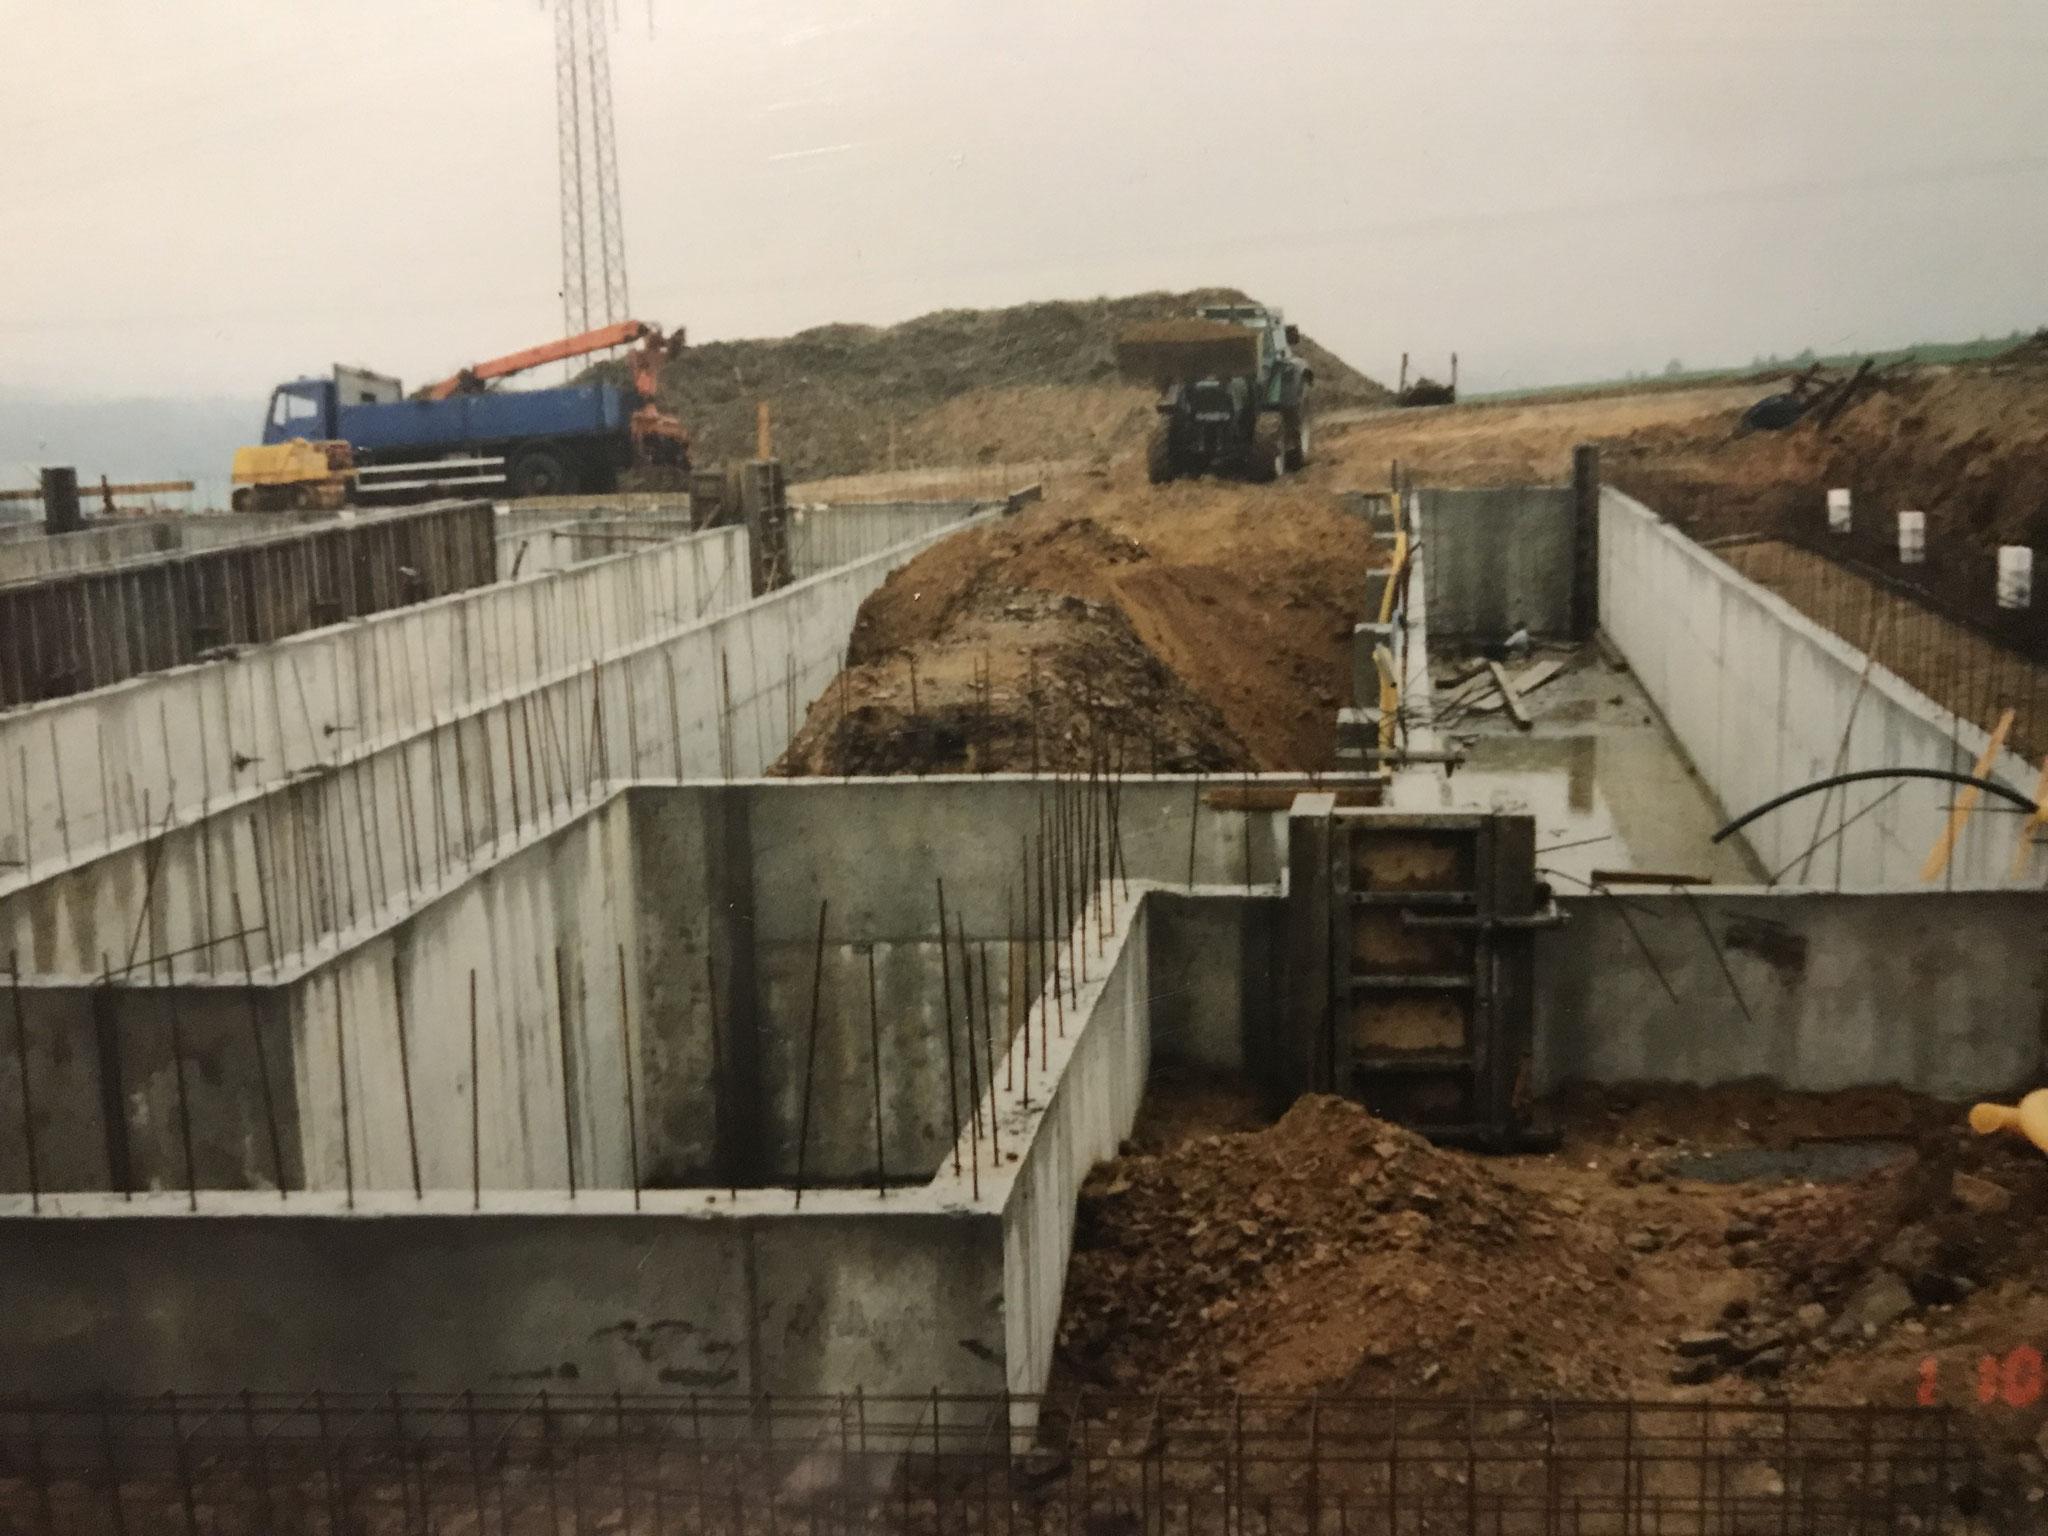 Bau des modernen Güllekellers